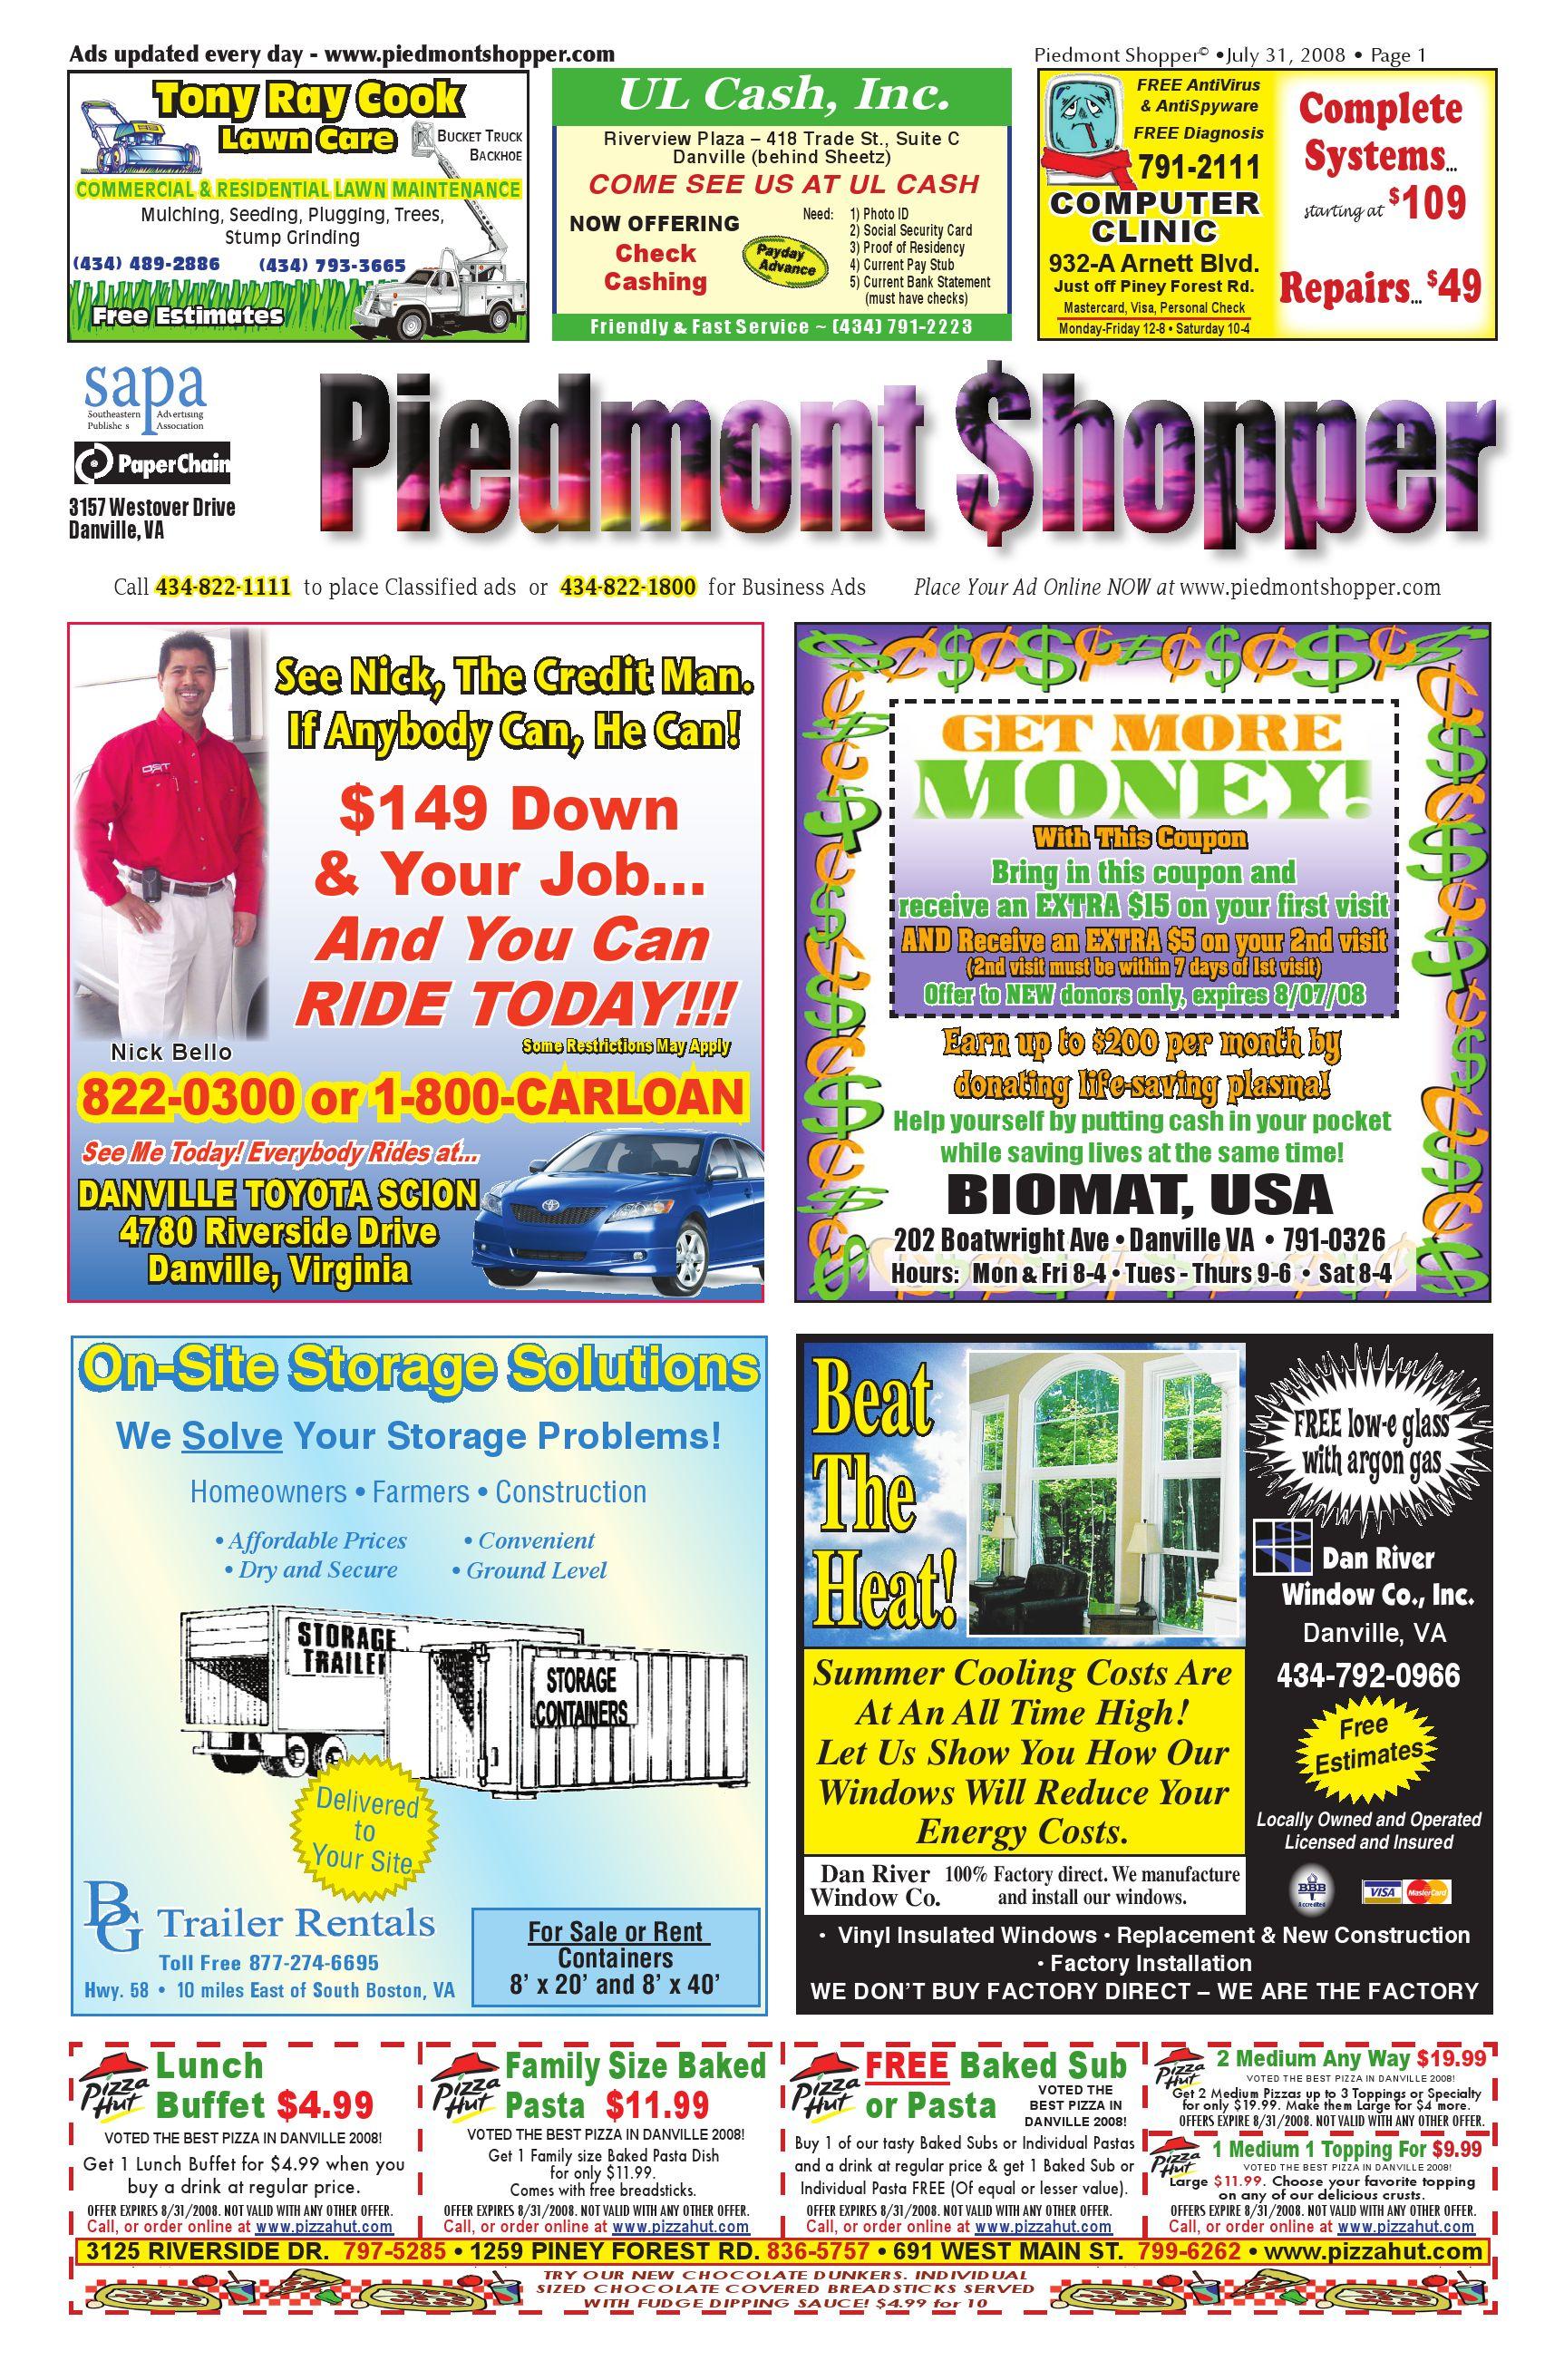 Piedmont Shopper 7312008 By Alan Lingerfelt Issuu Com 1374 Holley1920onebarrelcarburetorexplodeddiagram